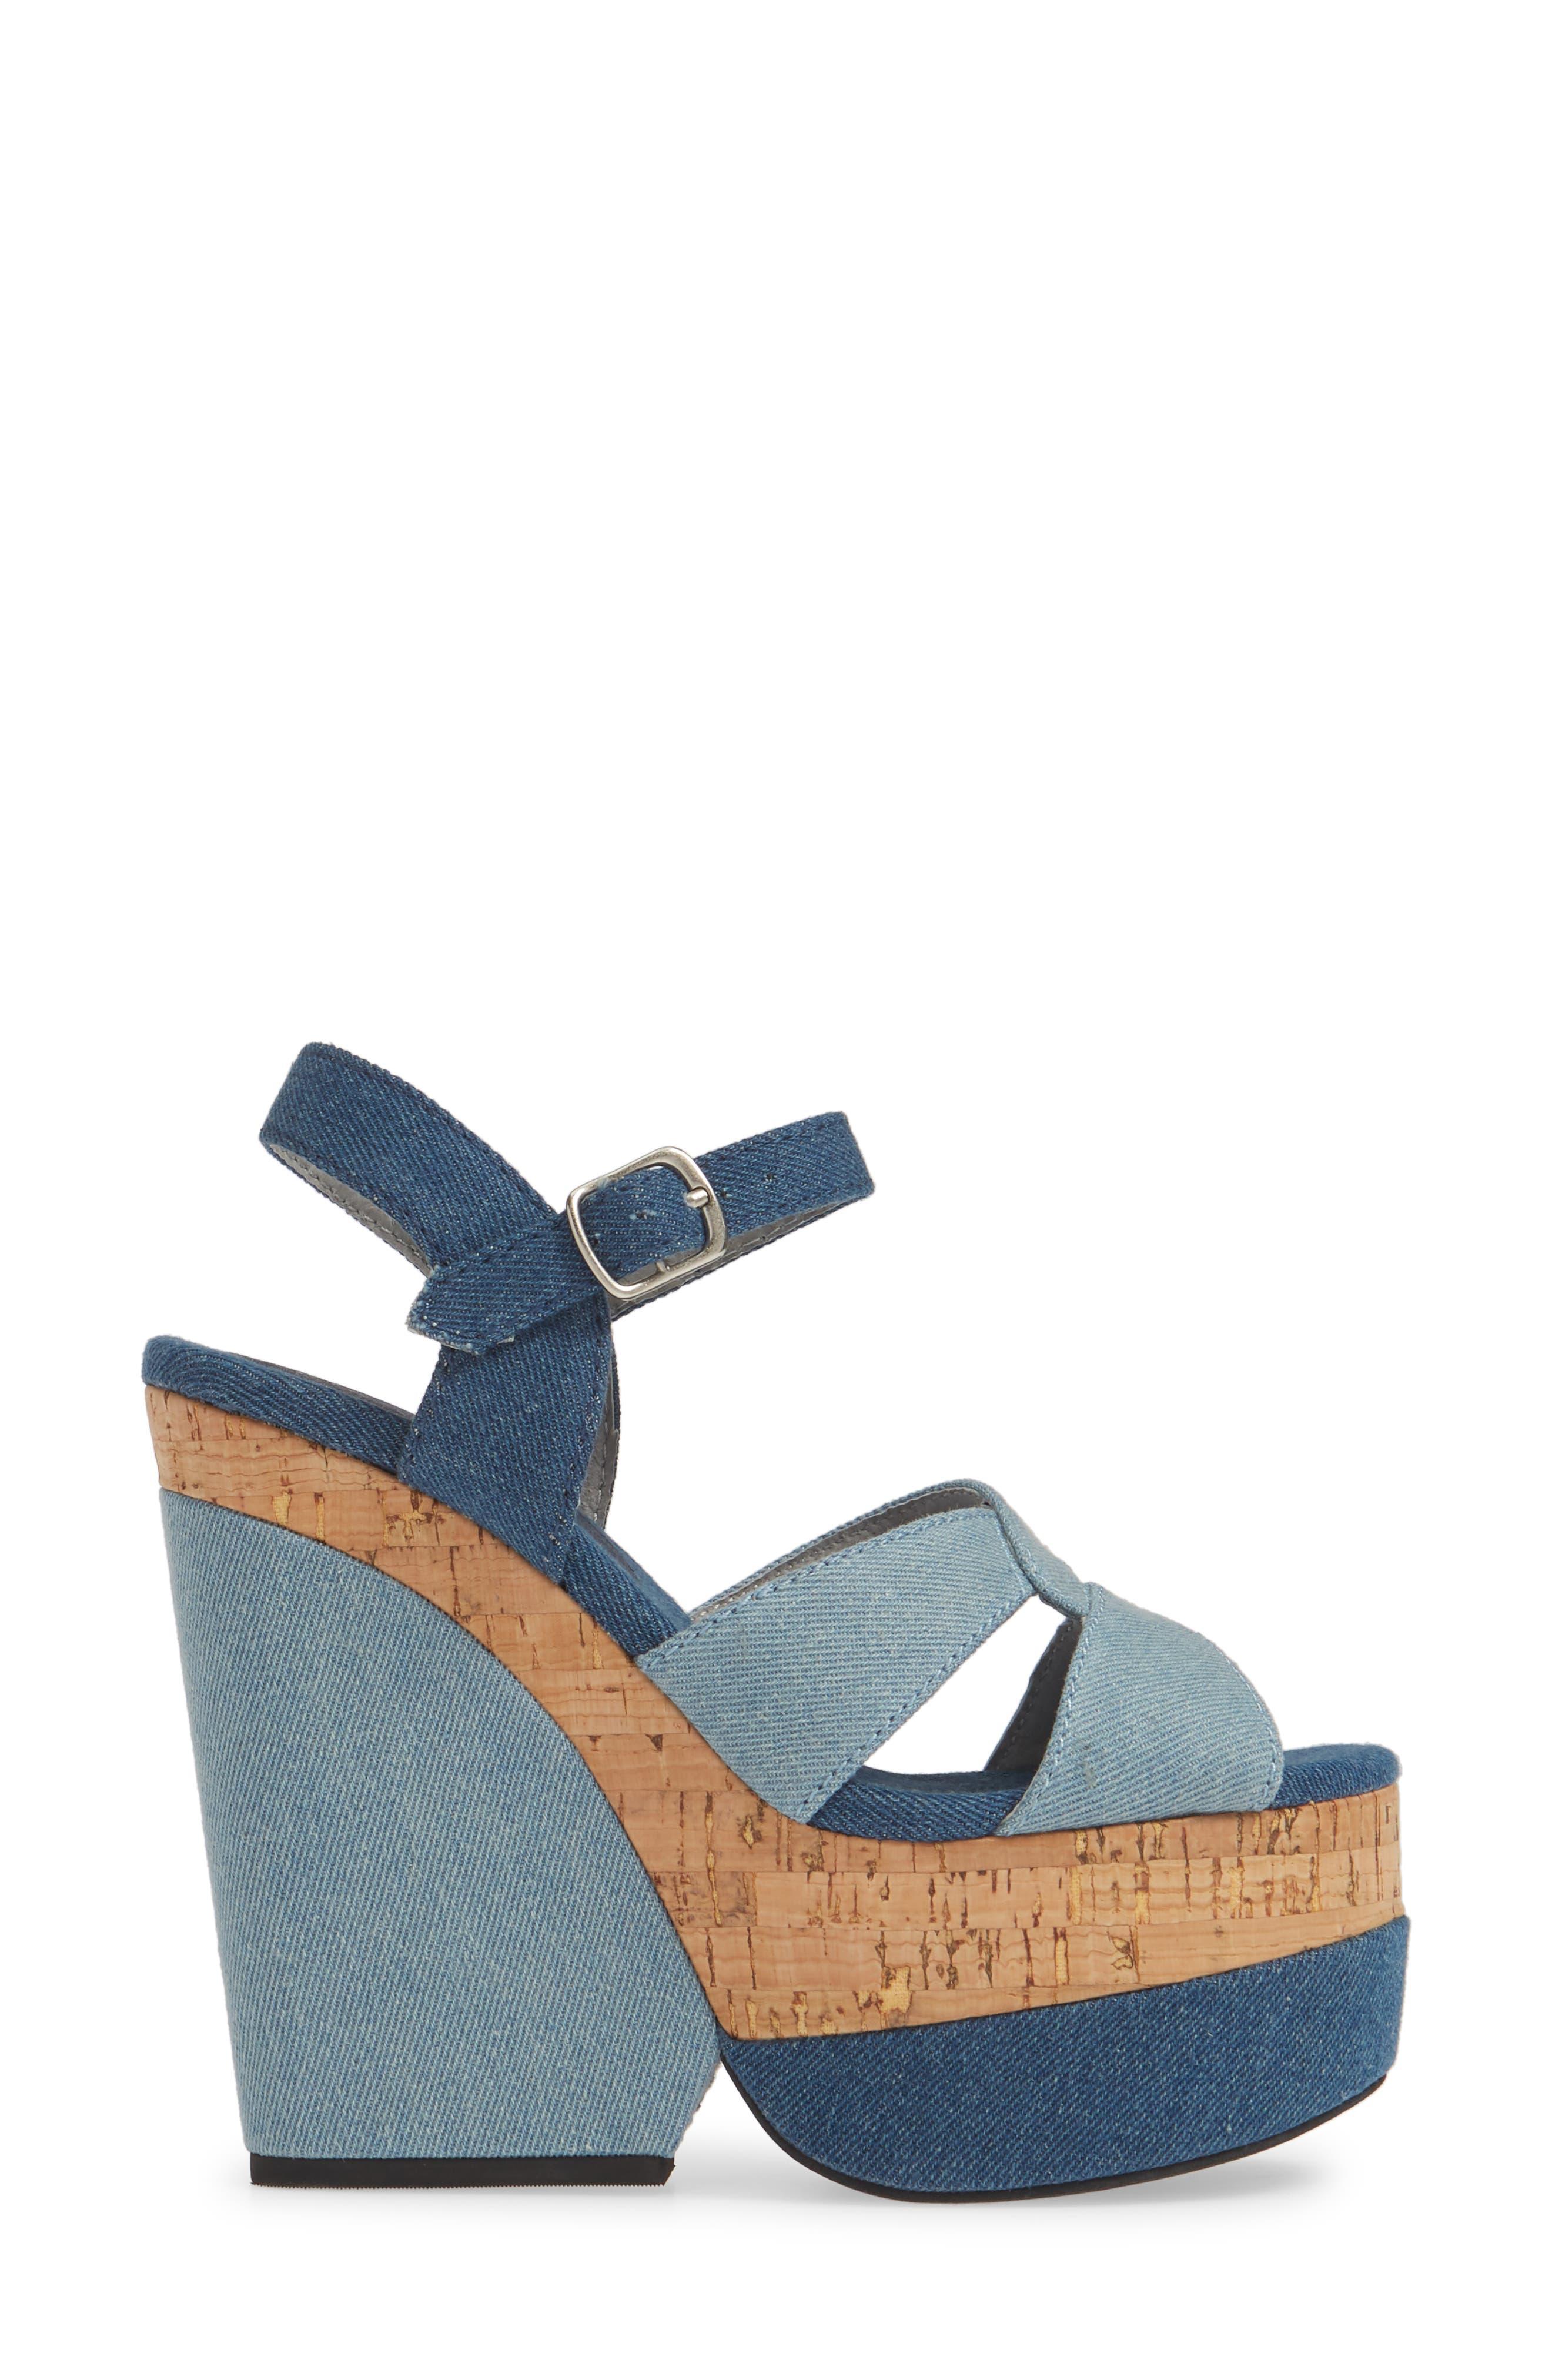 JEFFREY CAMPBELL, Wedge Platform Sandal, Alternate thumbnail 3, color, BLUE DENIM COMBO/ CORK